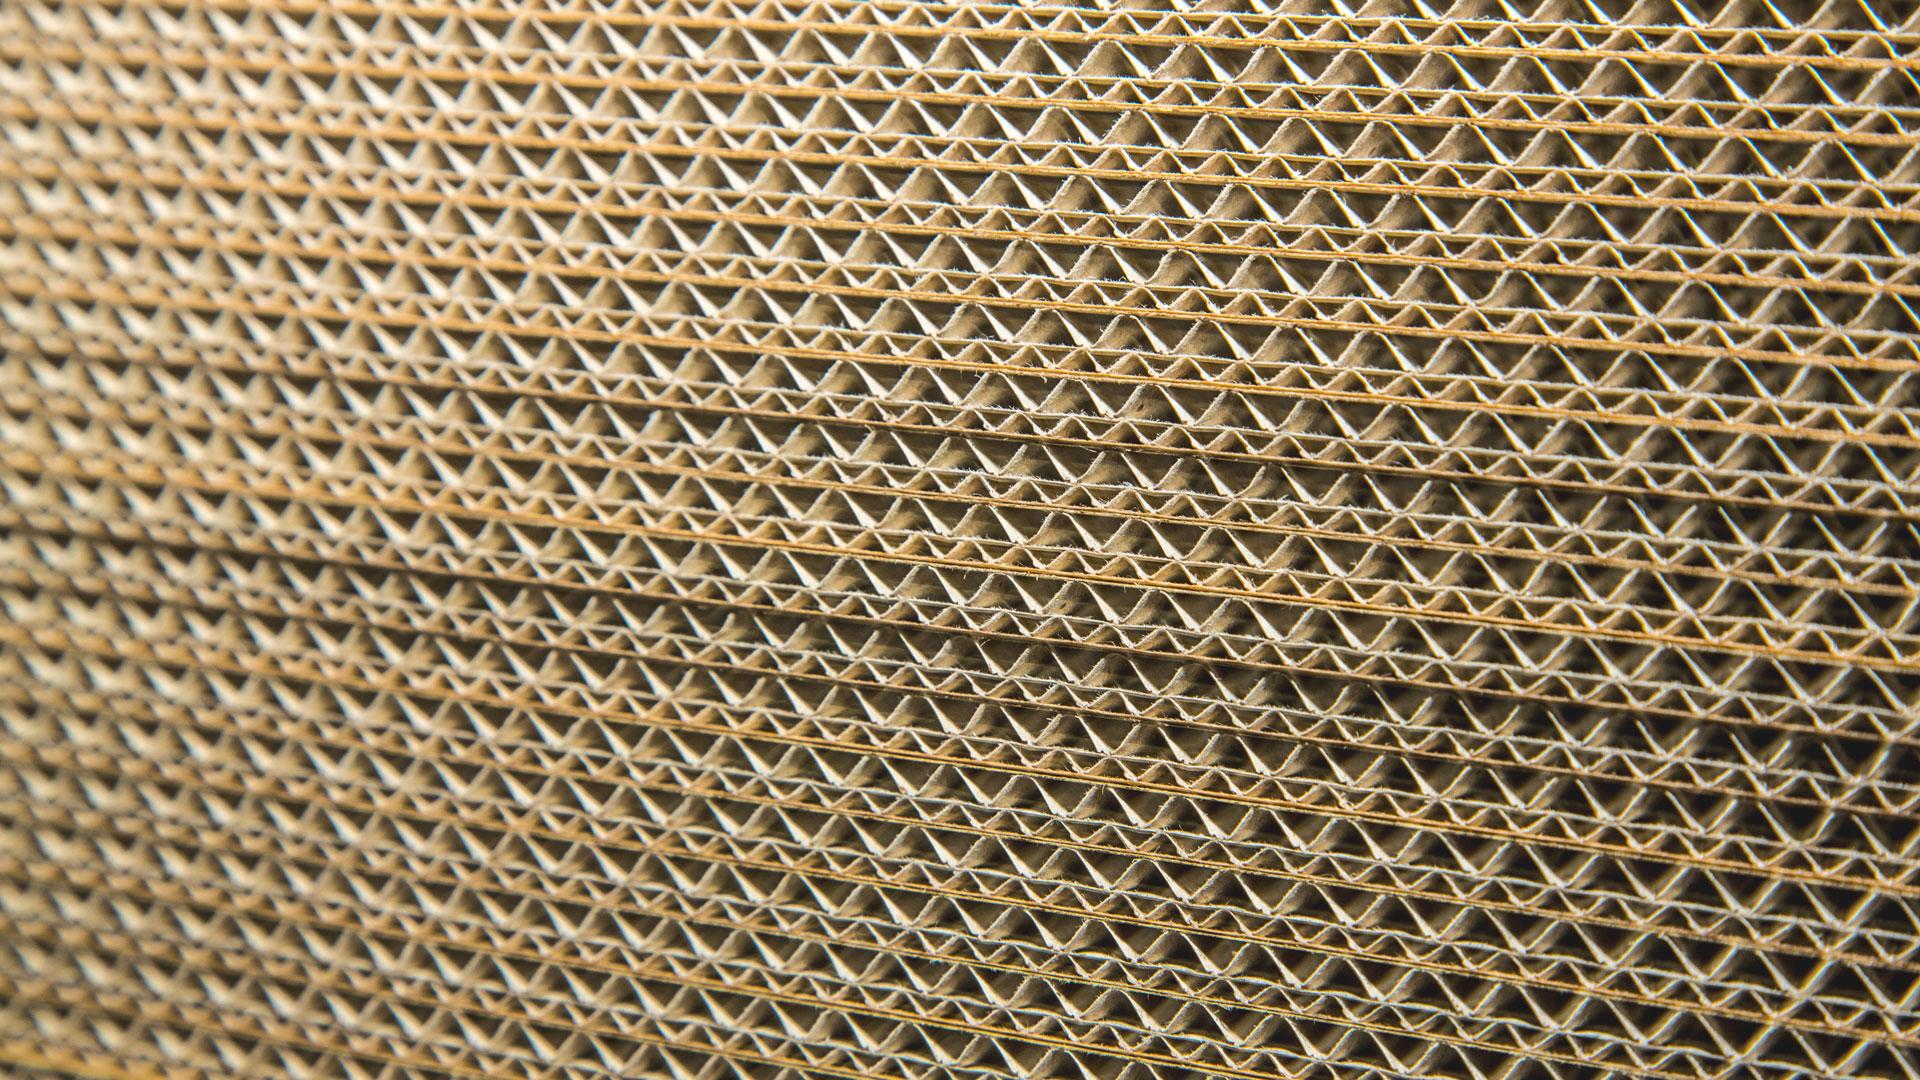 Corrugated board close up display